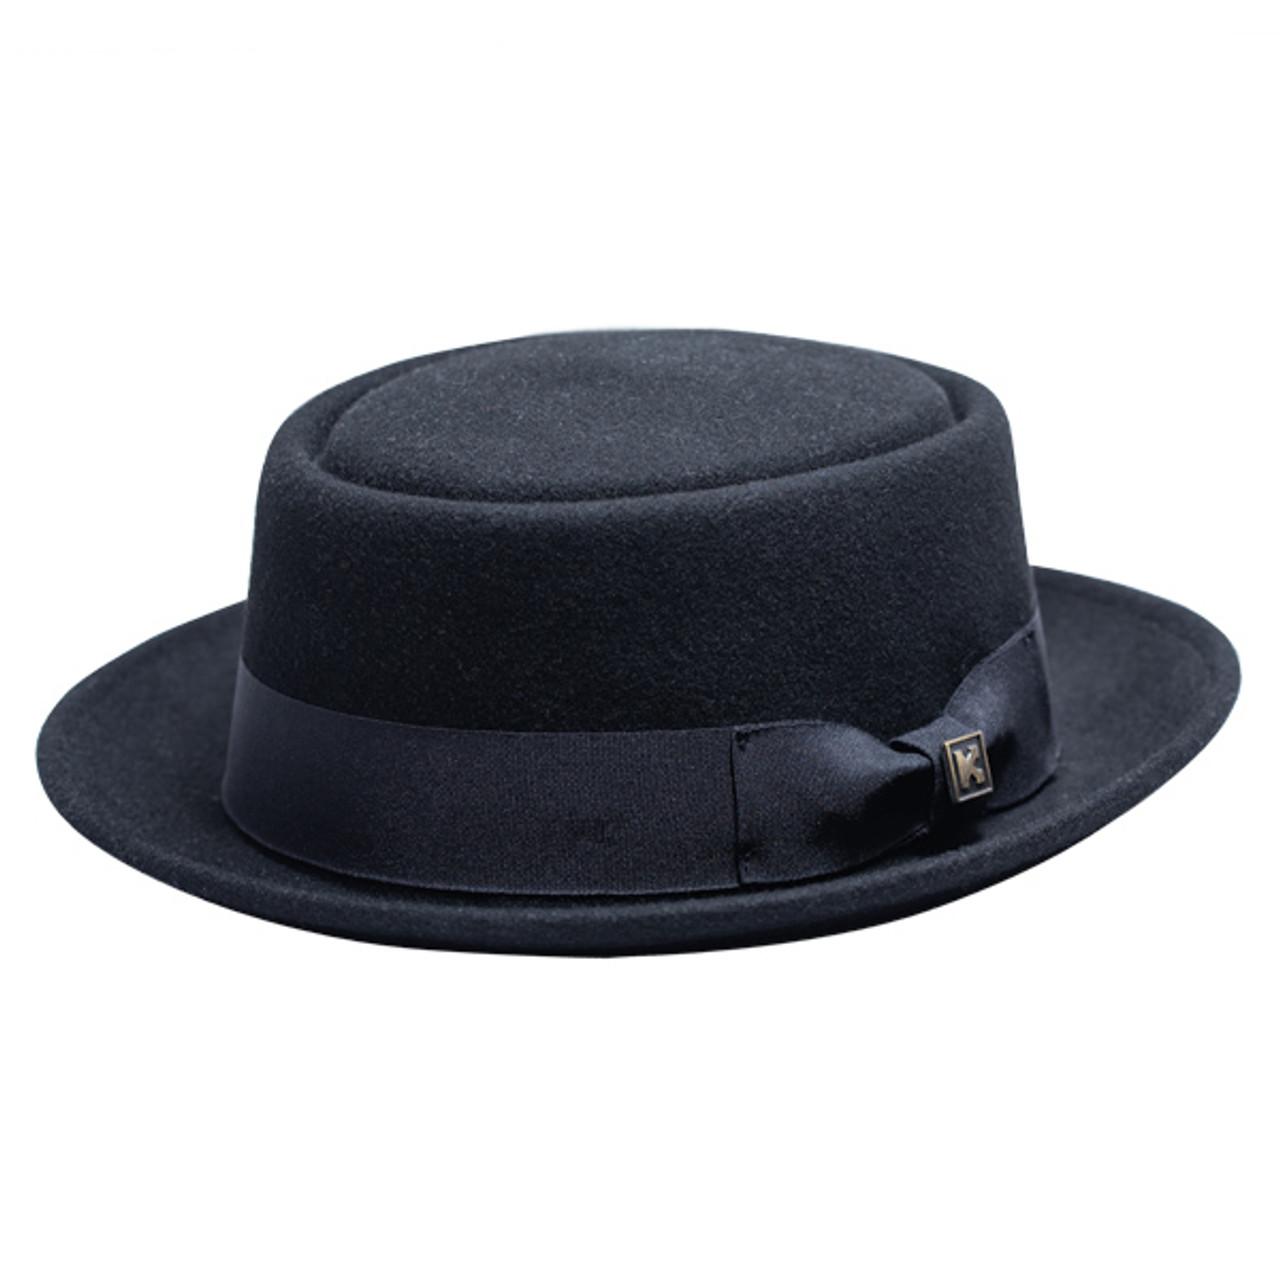 Kenny K Heisenberg Black Wool Felt Pork Pie Hat Hats Unlimited